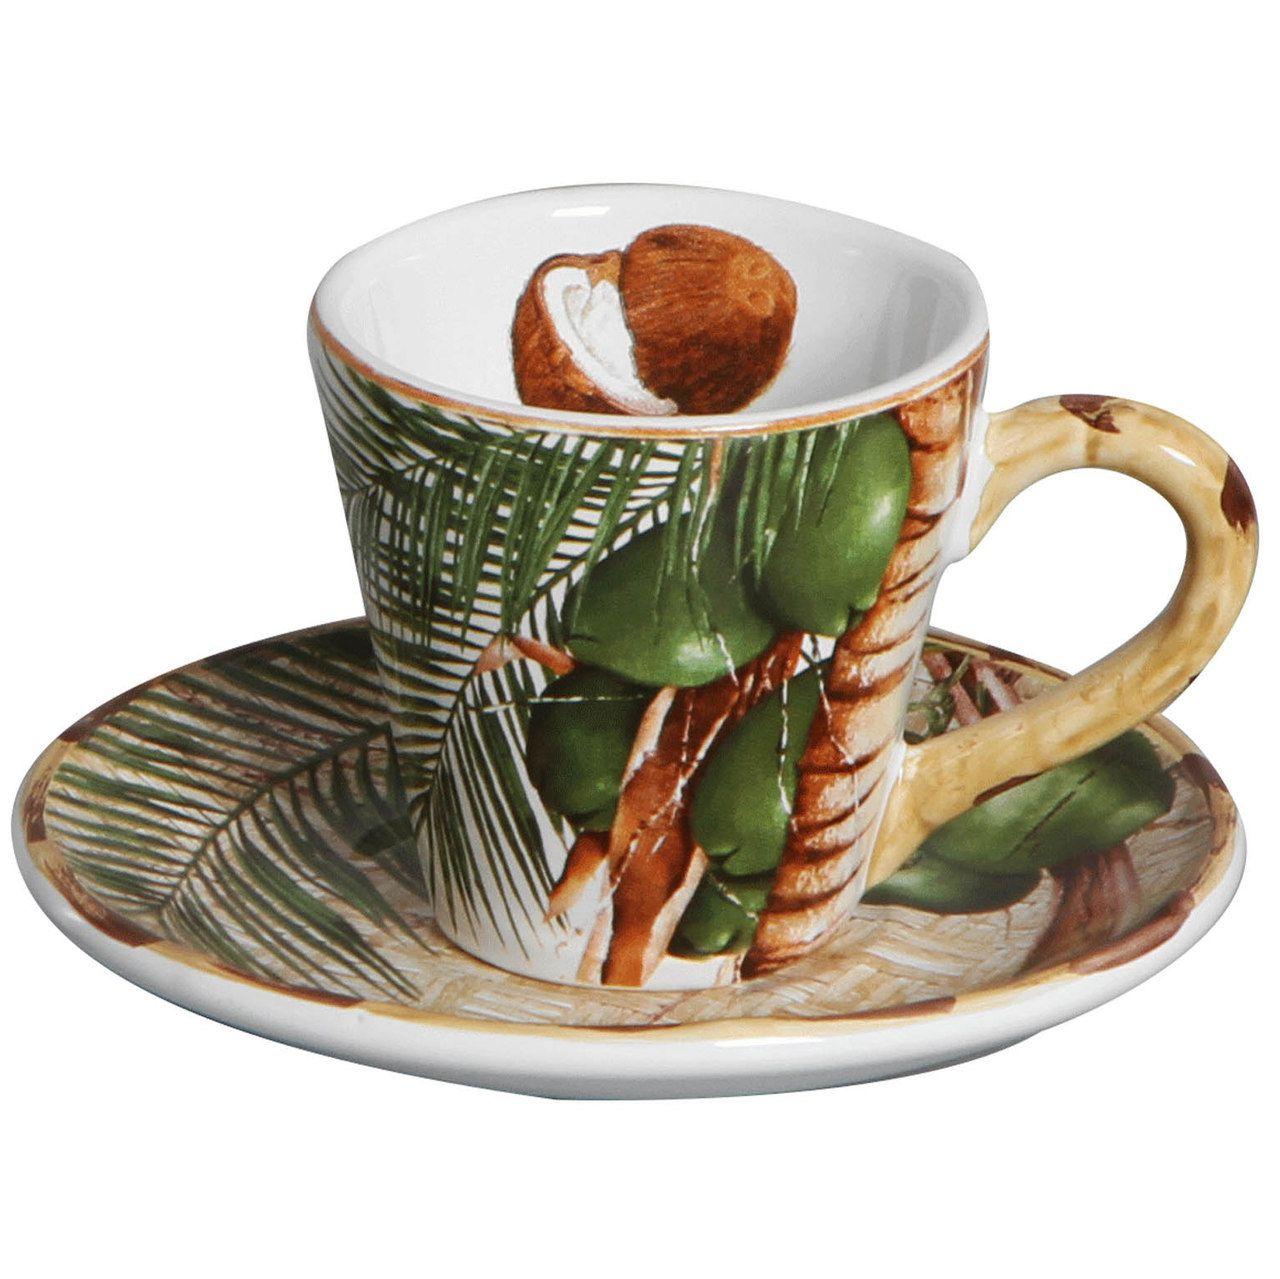 Xícara de Chá c/ Pires Itacaré (06 Unidades)  - MB